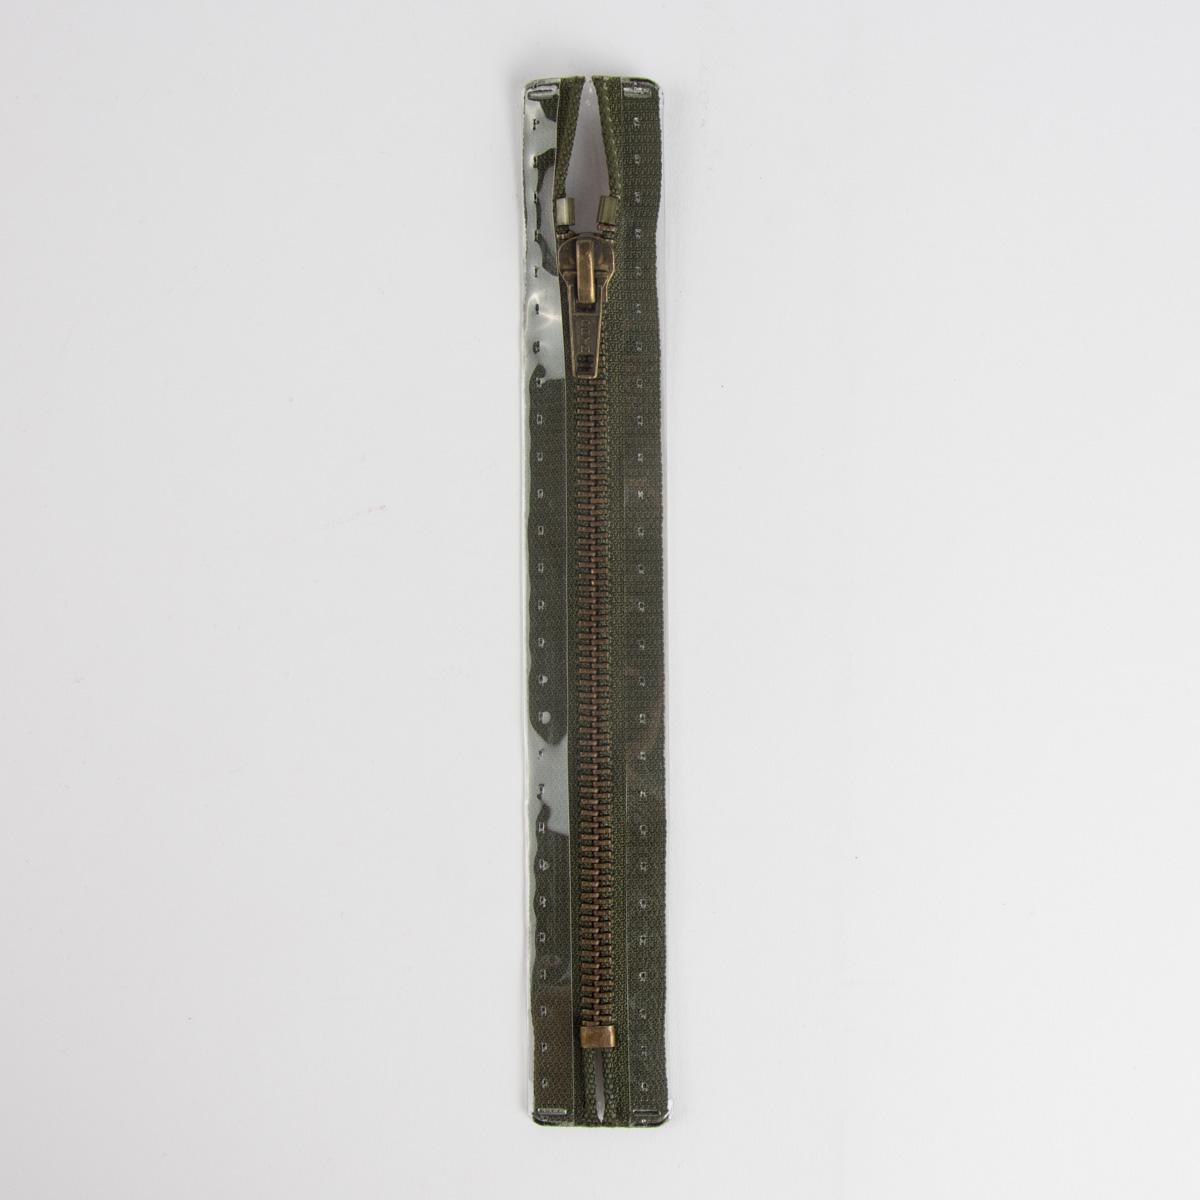 Reißverschluss M6 Typ 10 ut 16 cm am-fb Fla br-oliv